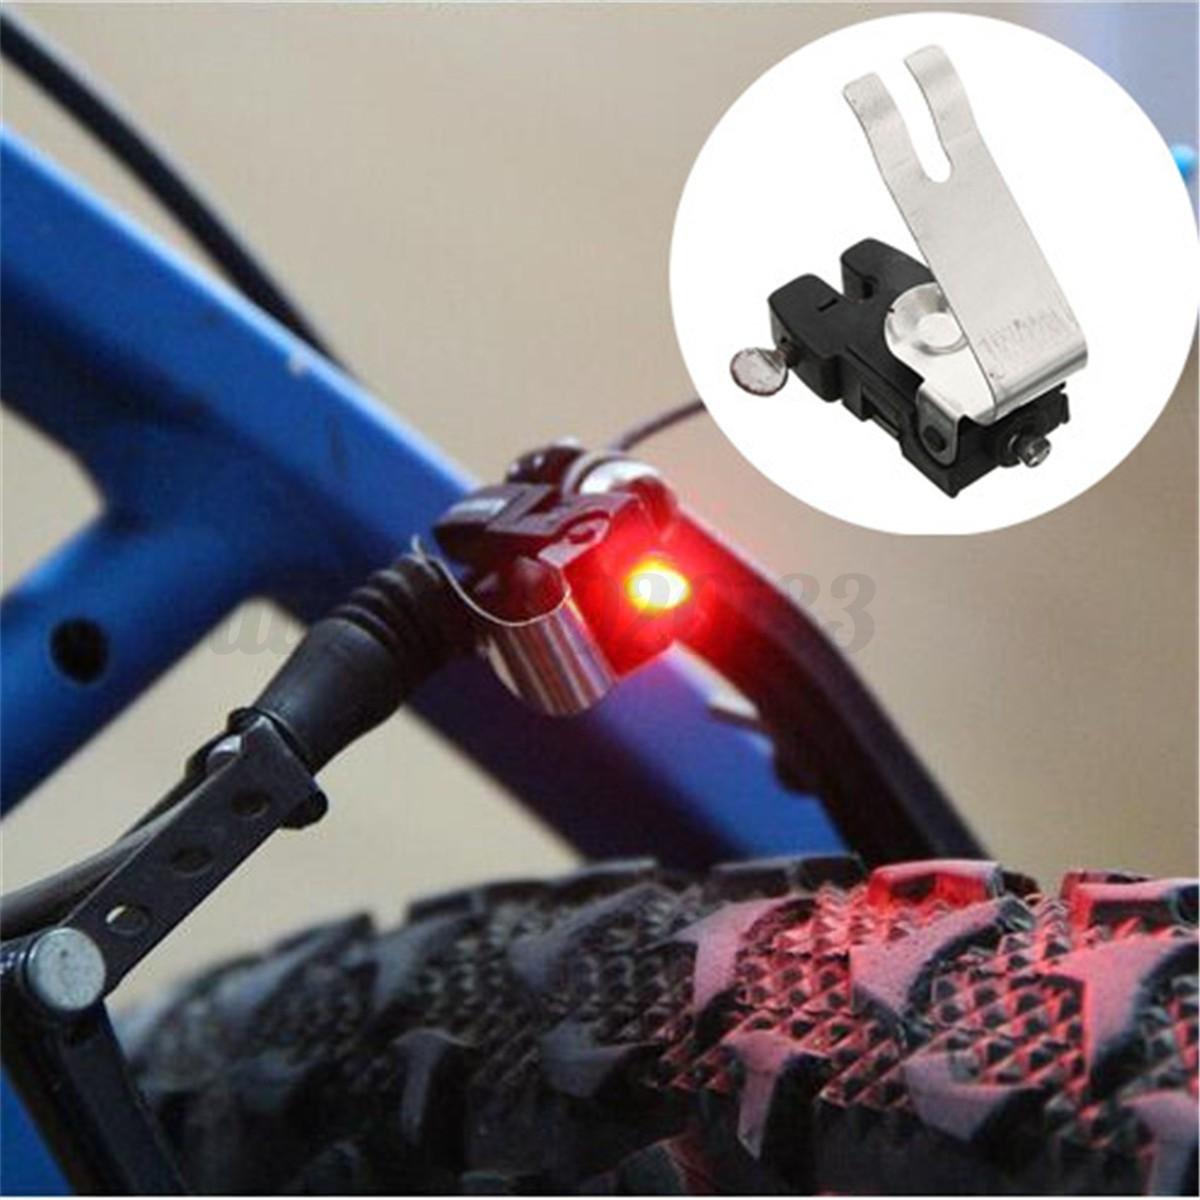 mini fahrrad rot led front licht fahrradbeleuchtung fahrradlampe fahrradleuchte ebay. Black Bedroom Furniture Sets. Home Design Ideas